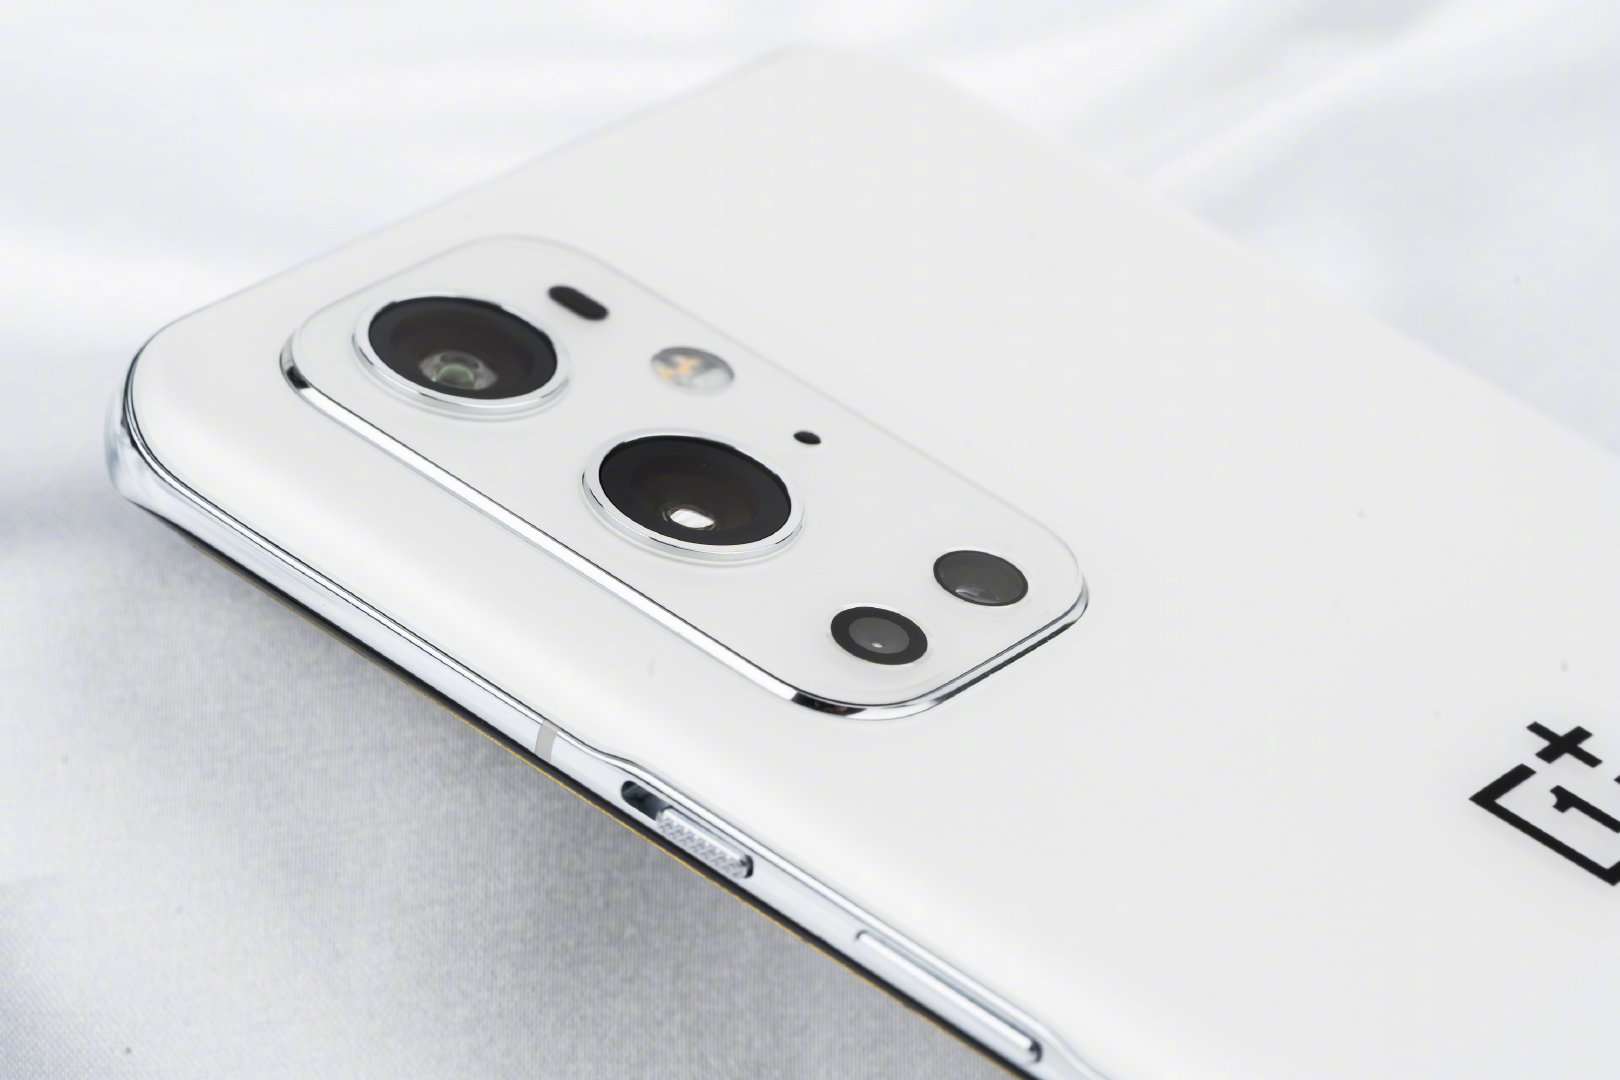 OnePlus visar upp vita OnePlus 9 Pro